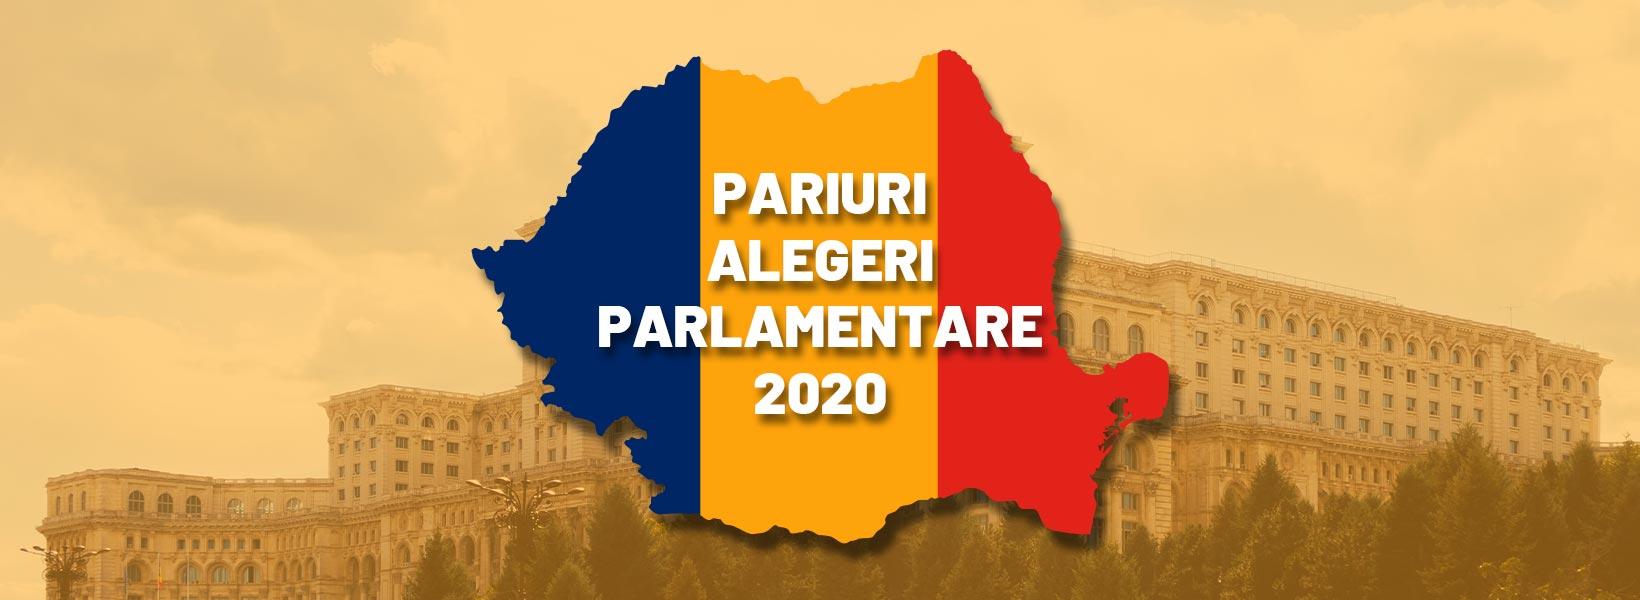 pariuri alegeri parlamentare